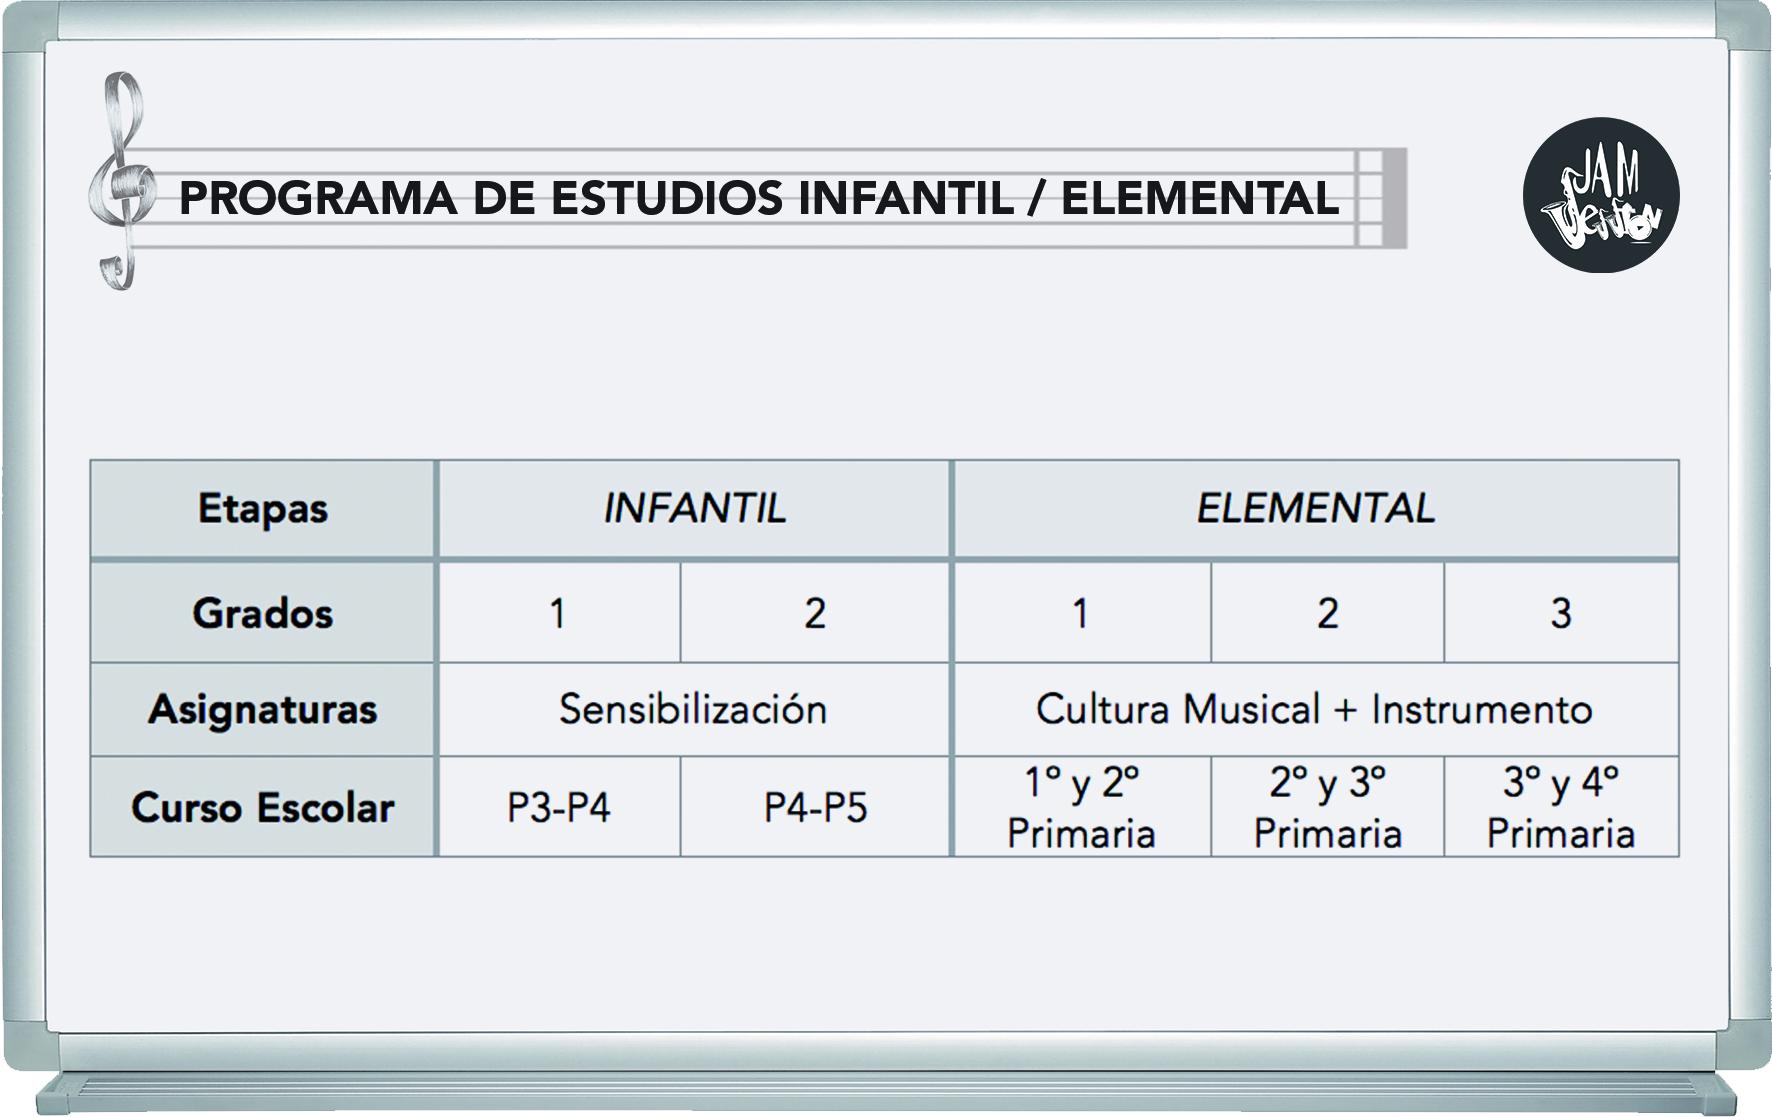 Programa de estudios infantil-elemental (cast) 3